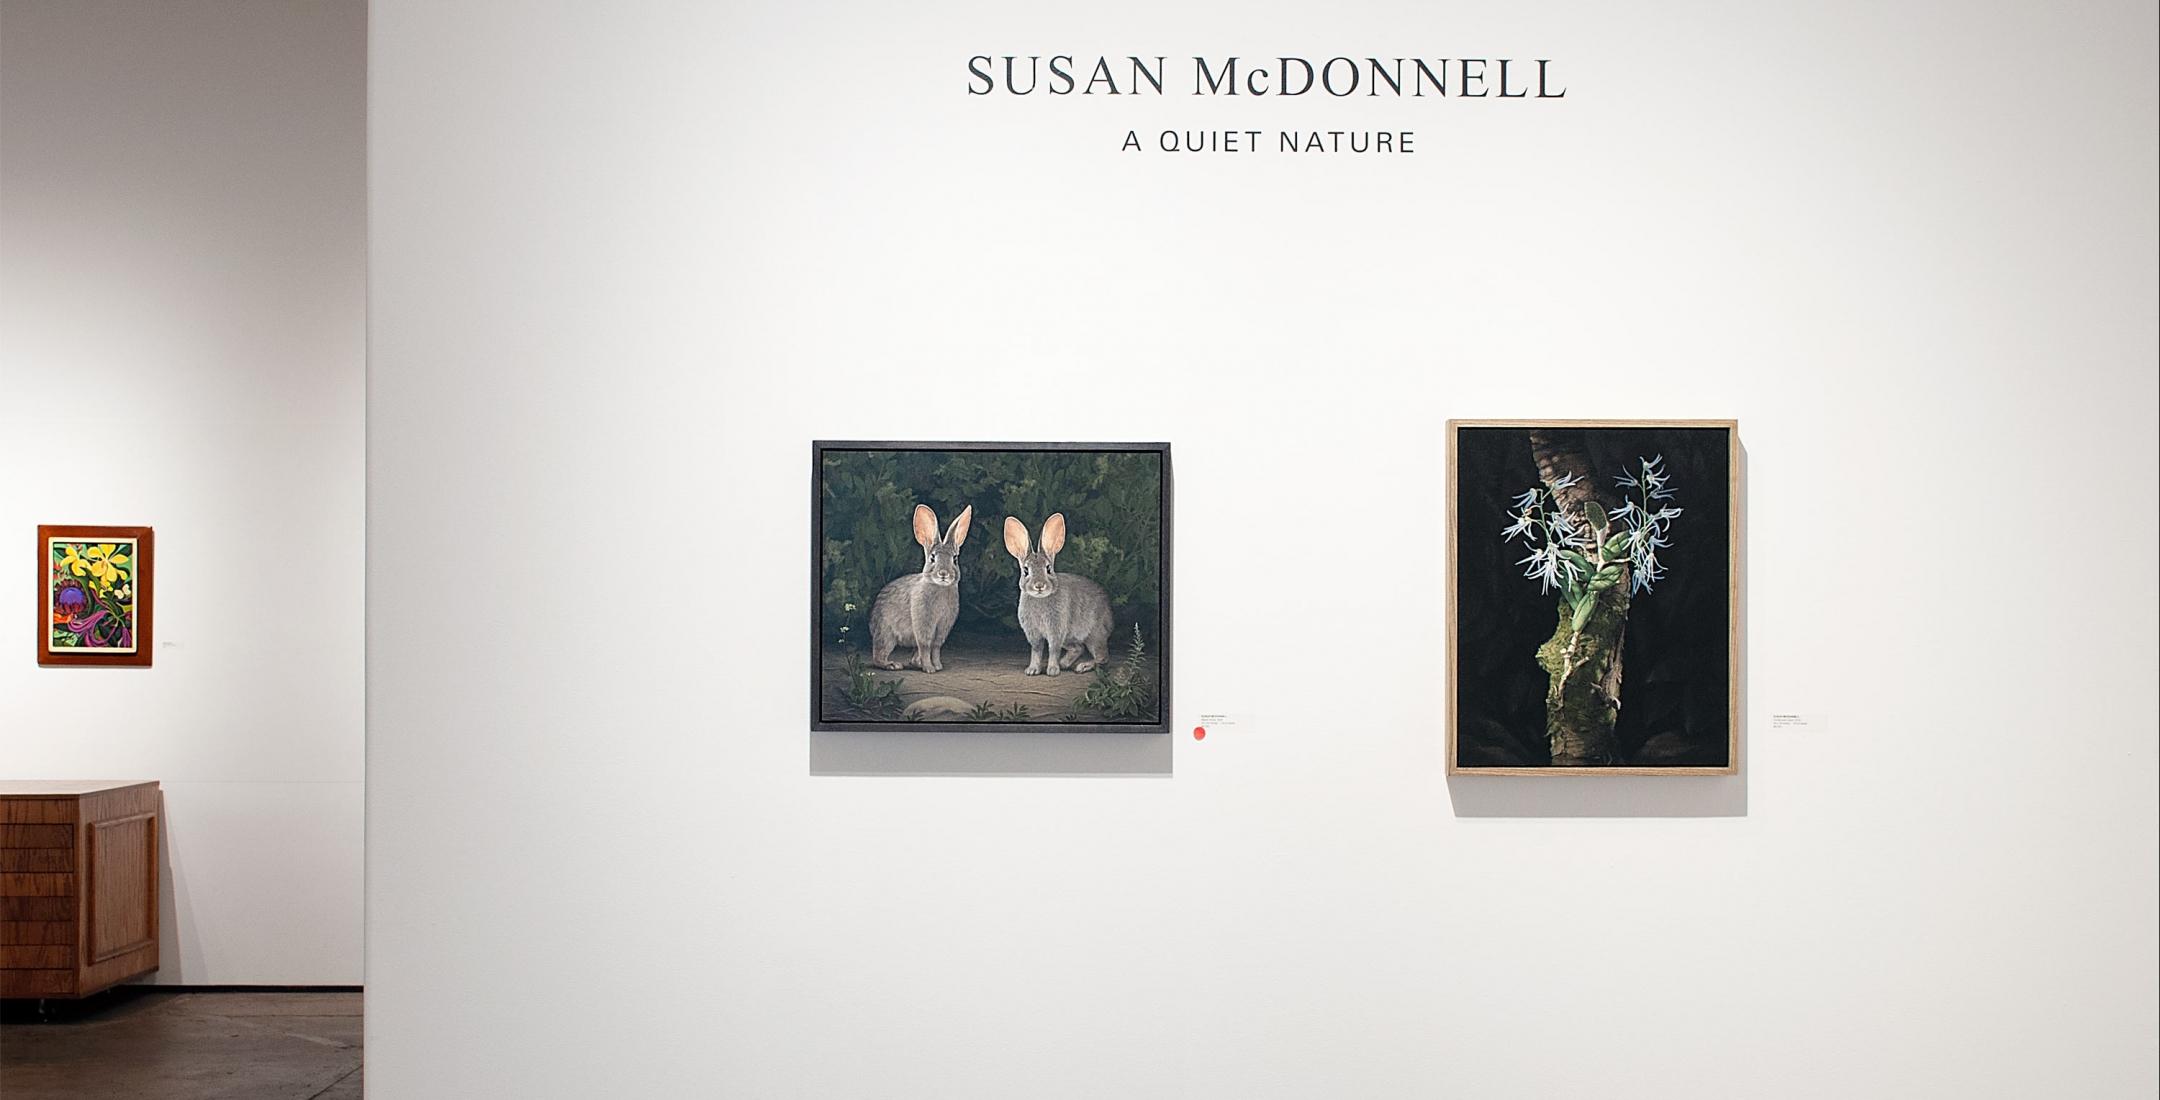 SUSAN MCDONNELL: A QUIET NATURE installation photograph